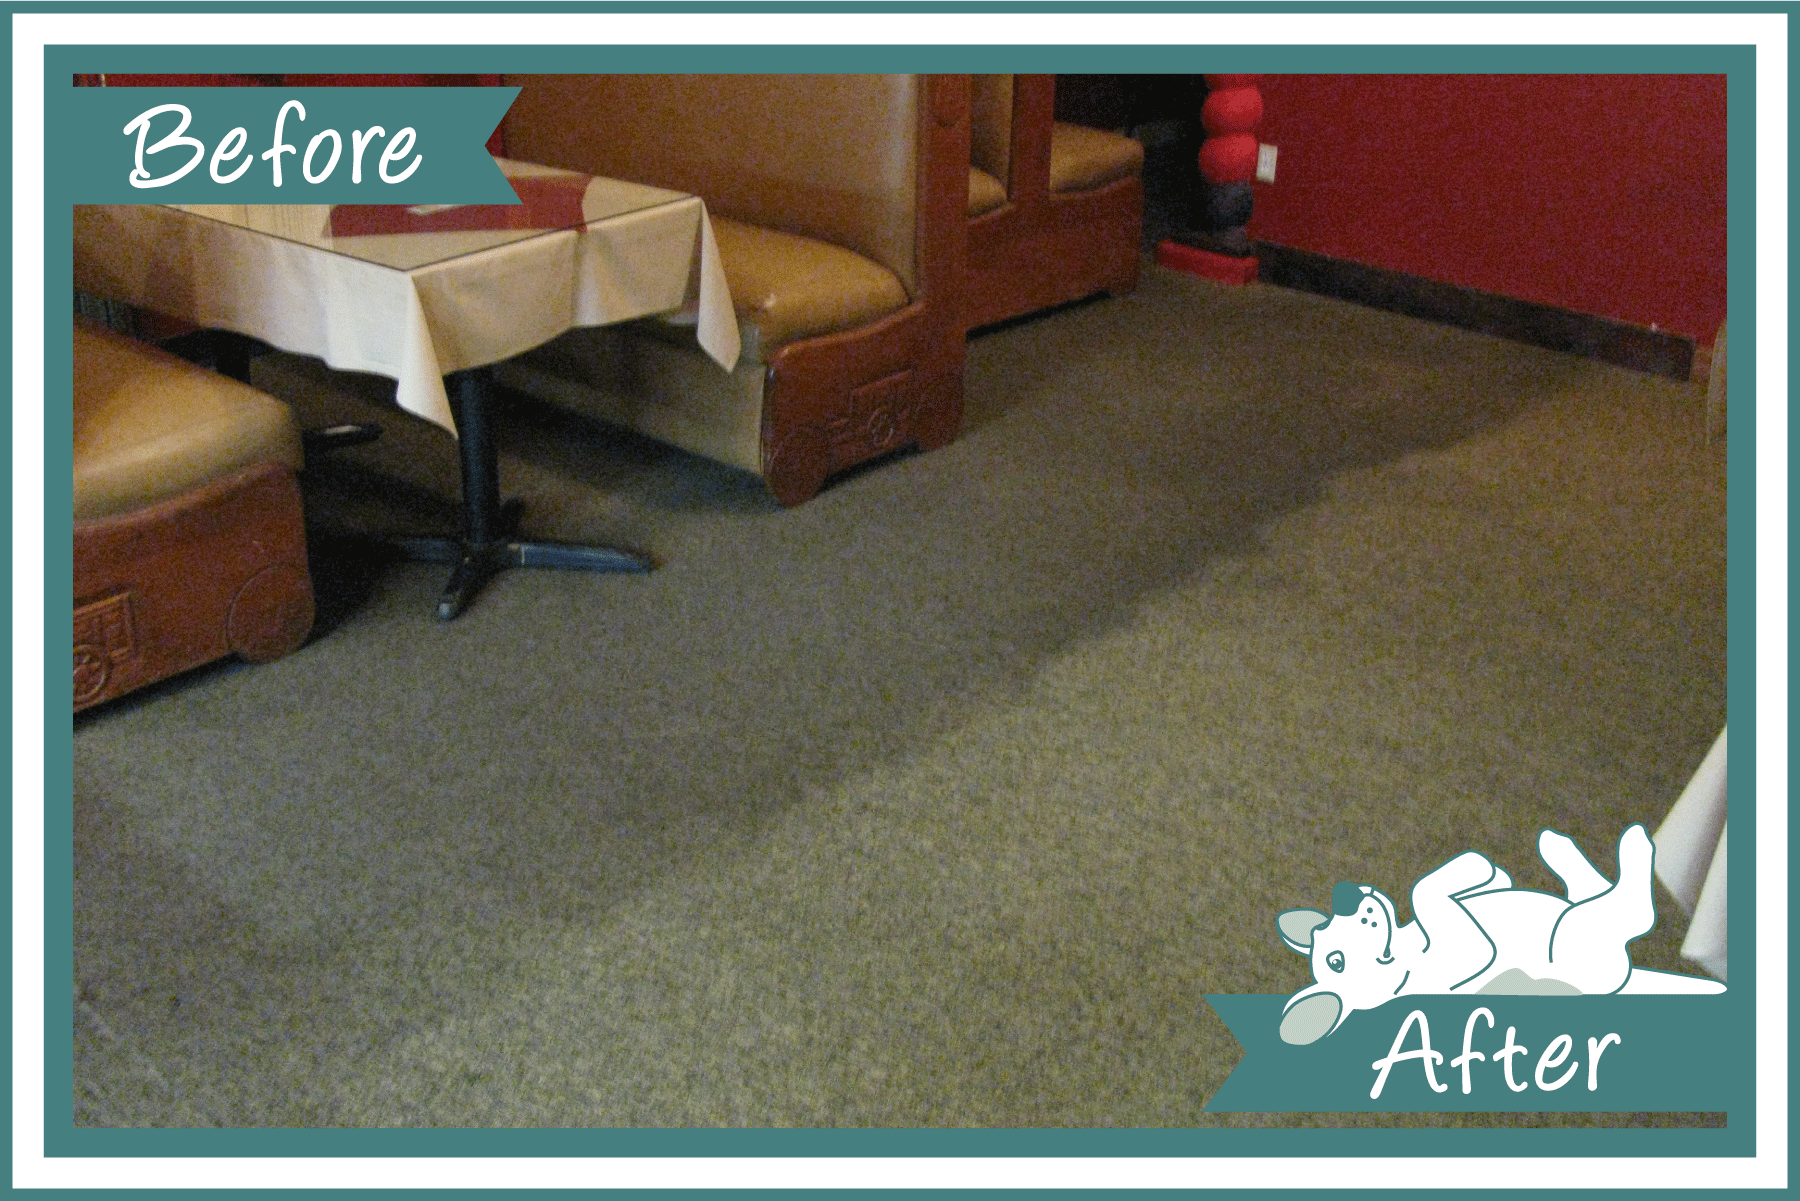 Dog-Gone-Clean-Carpet_BEFORE-AFTER